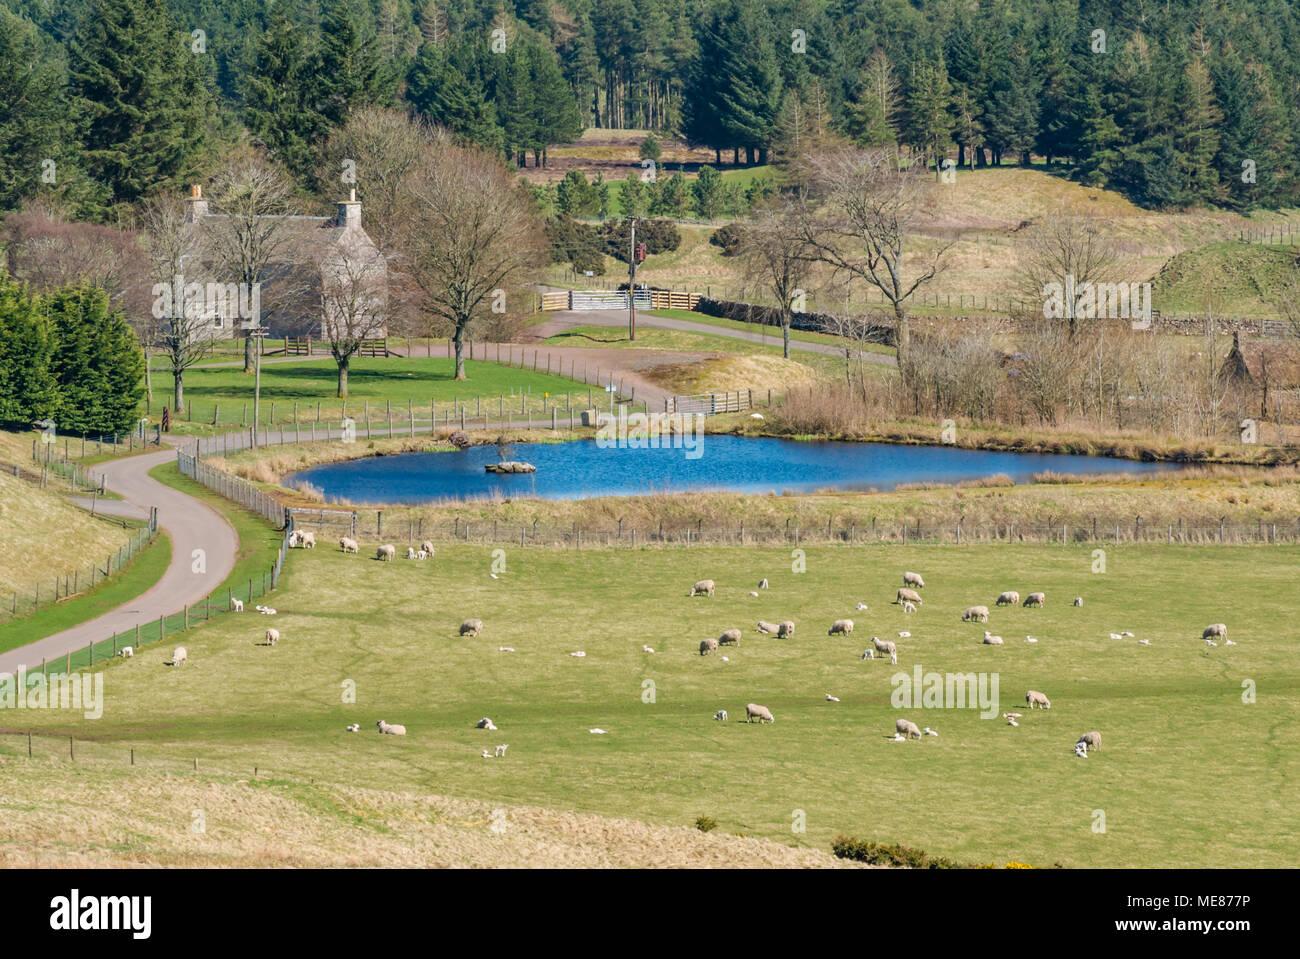 Farm House Scottish Borders Stock Photos & Farm House Scottish Borders Stock Images - Alamy